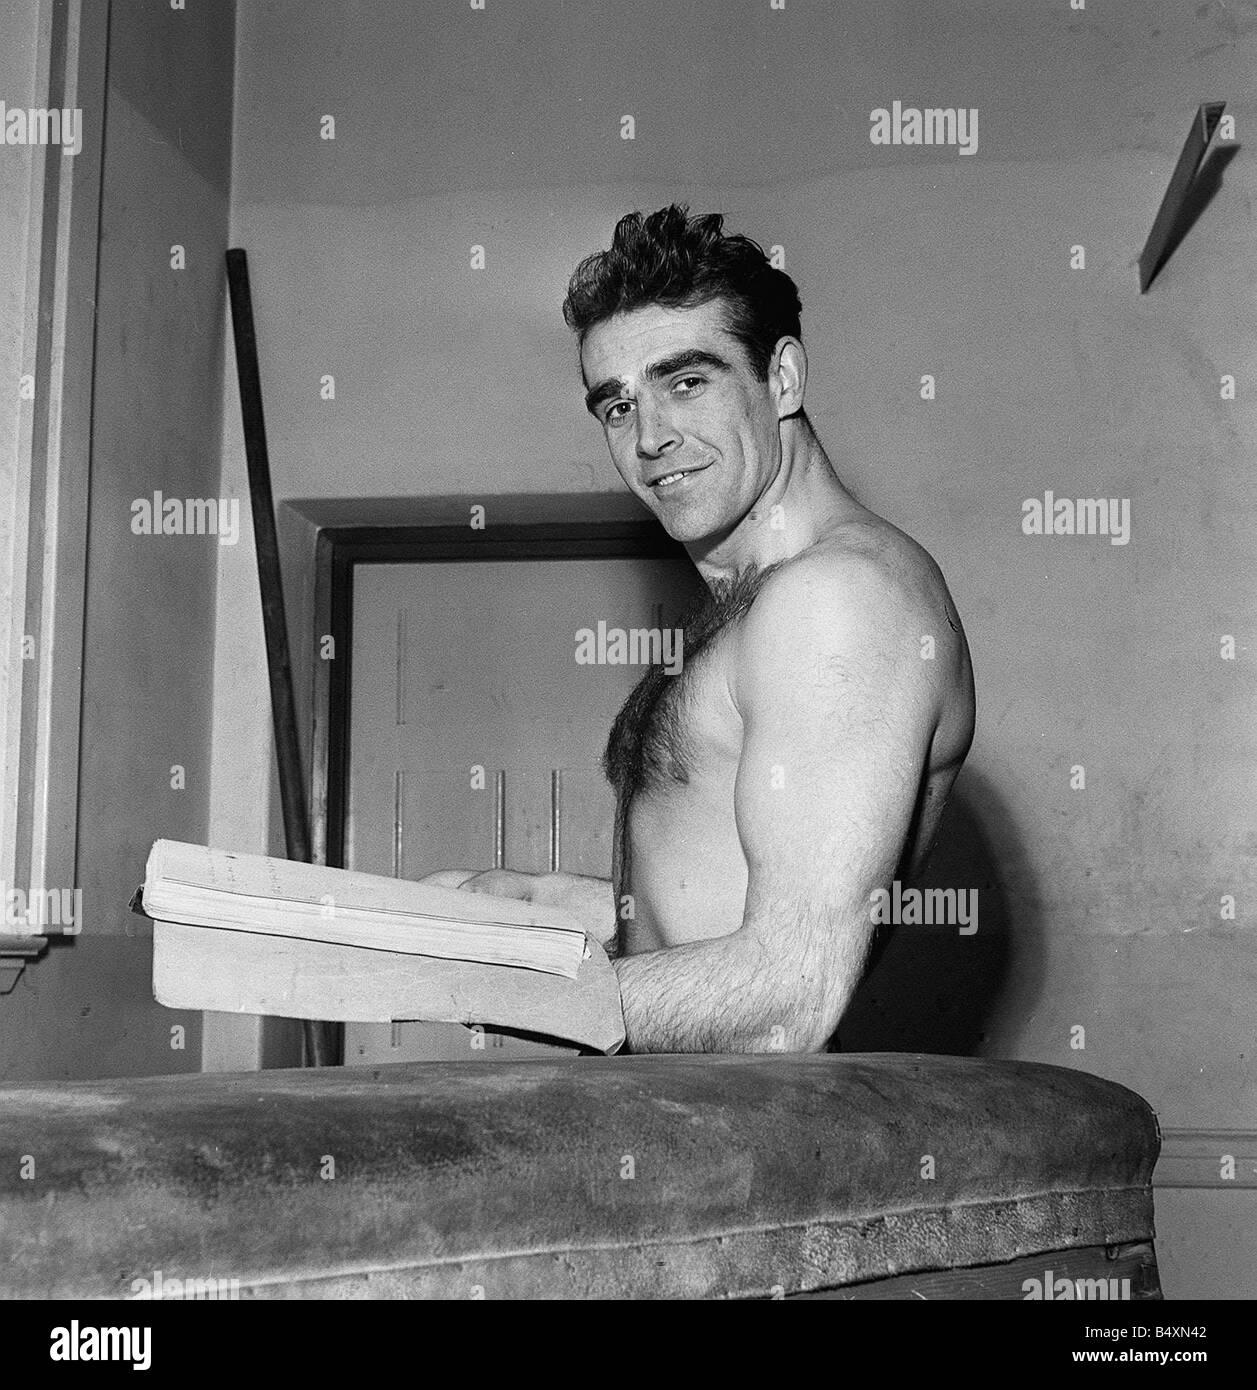 sean connery 1957 stock photo 20256322 alamy